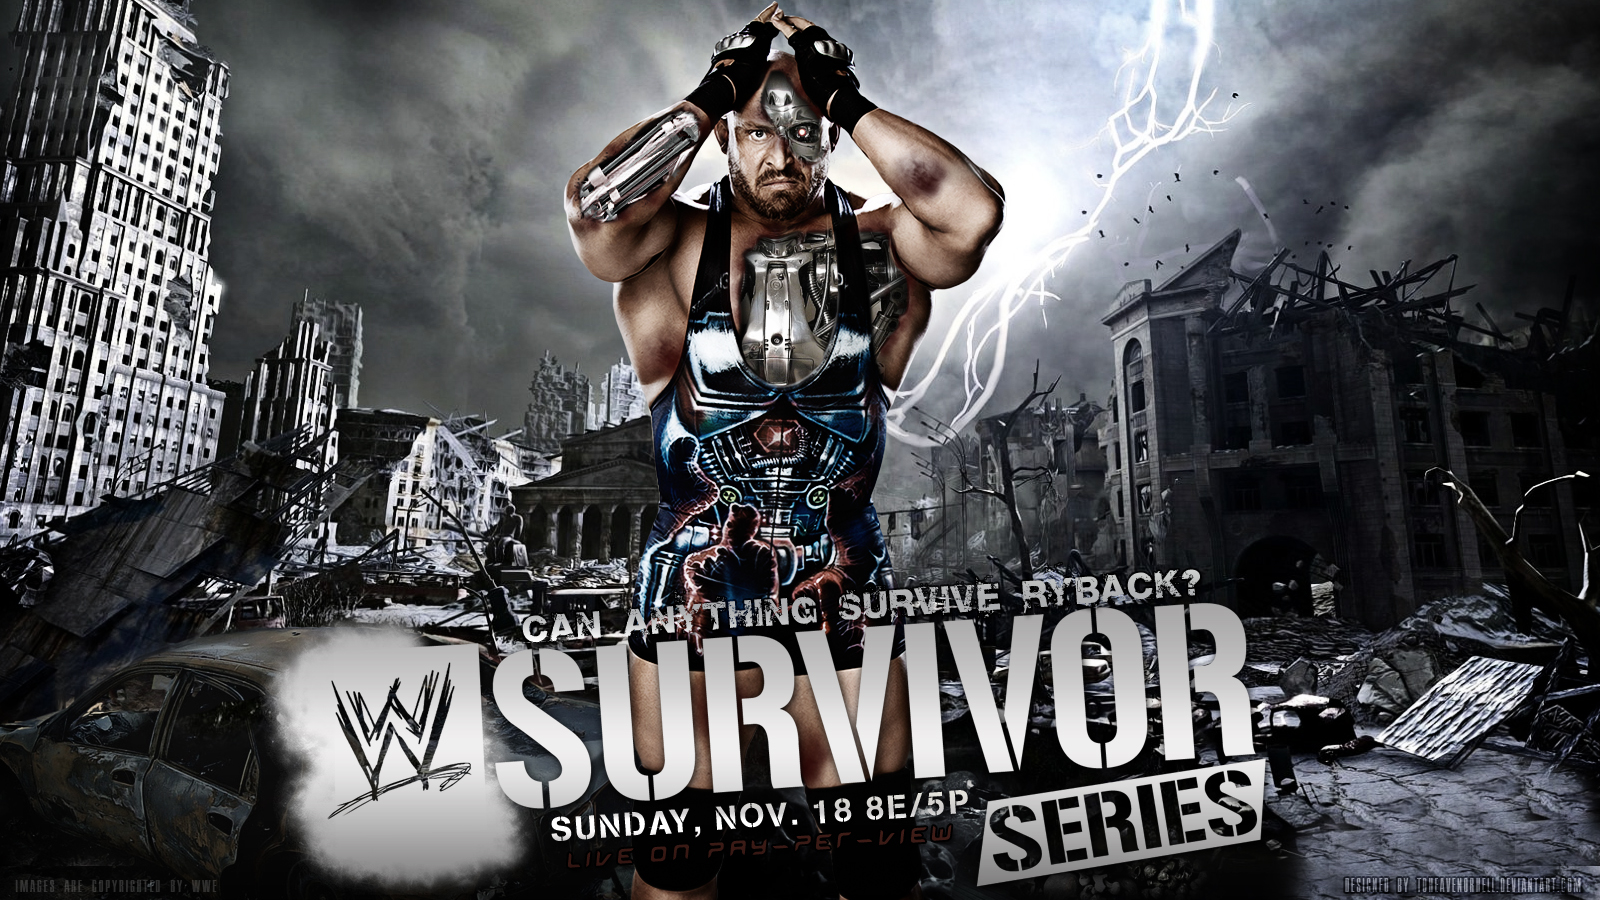 WWE Survivor Series 2012 Wallpaper Ryback by ToHeavenOrHell